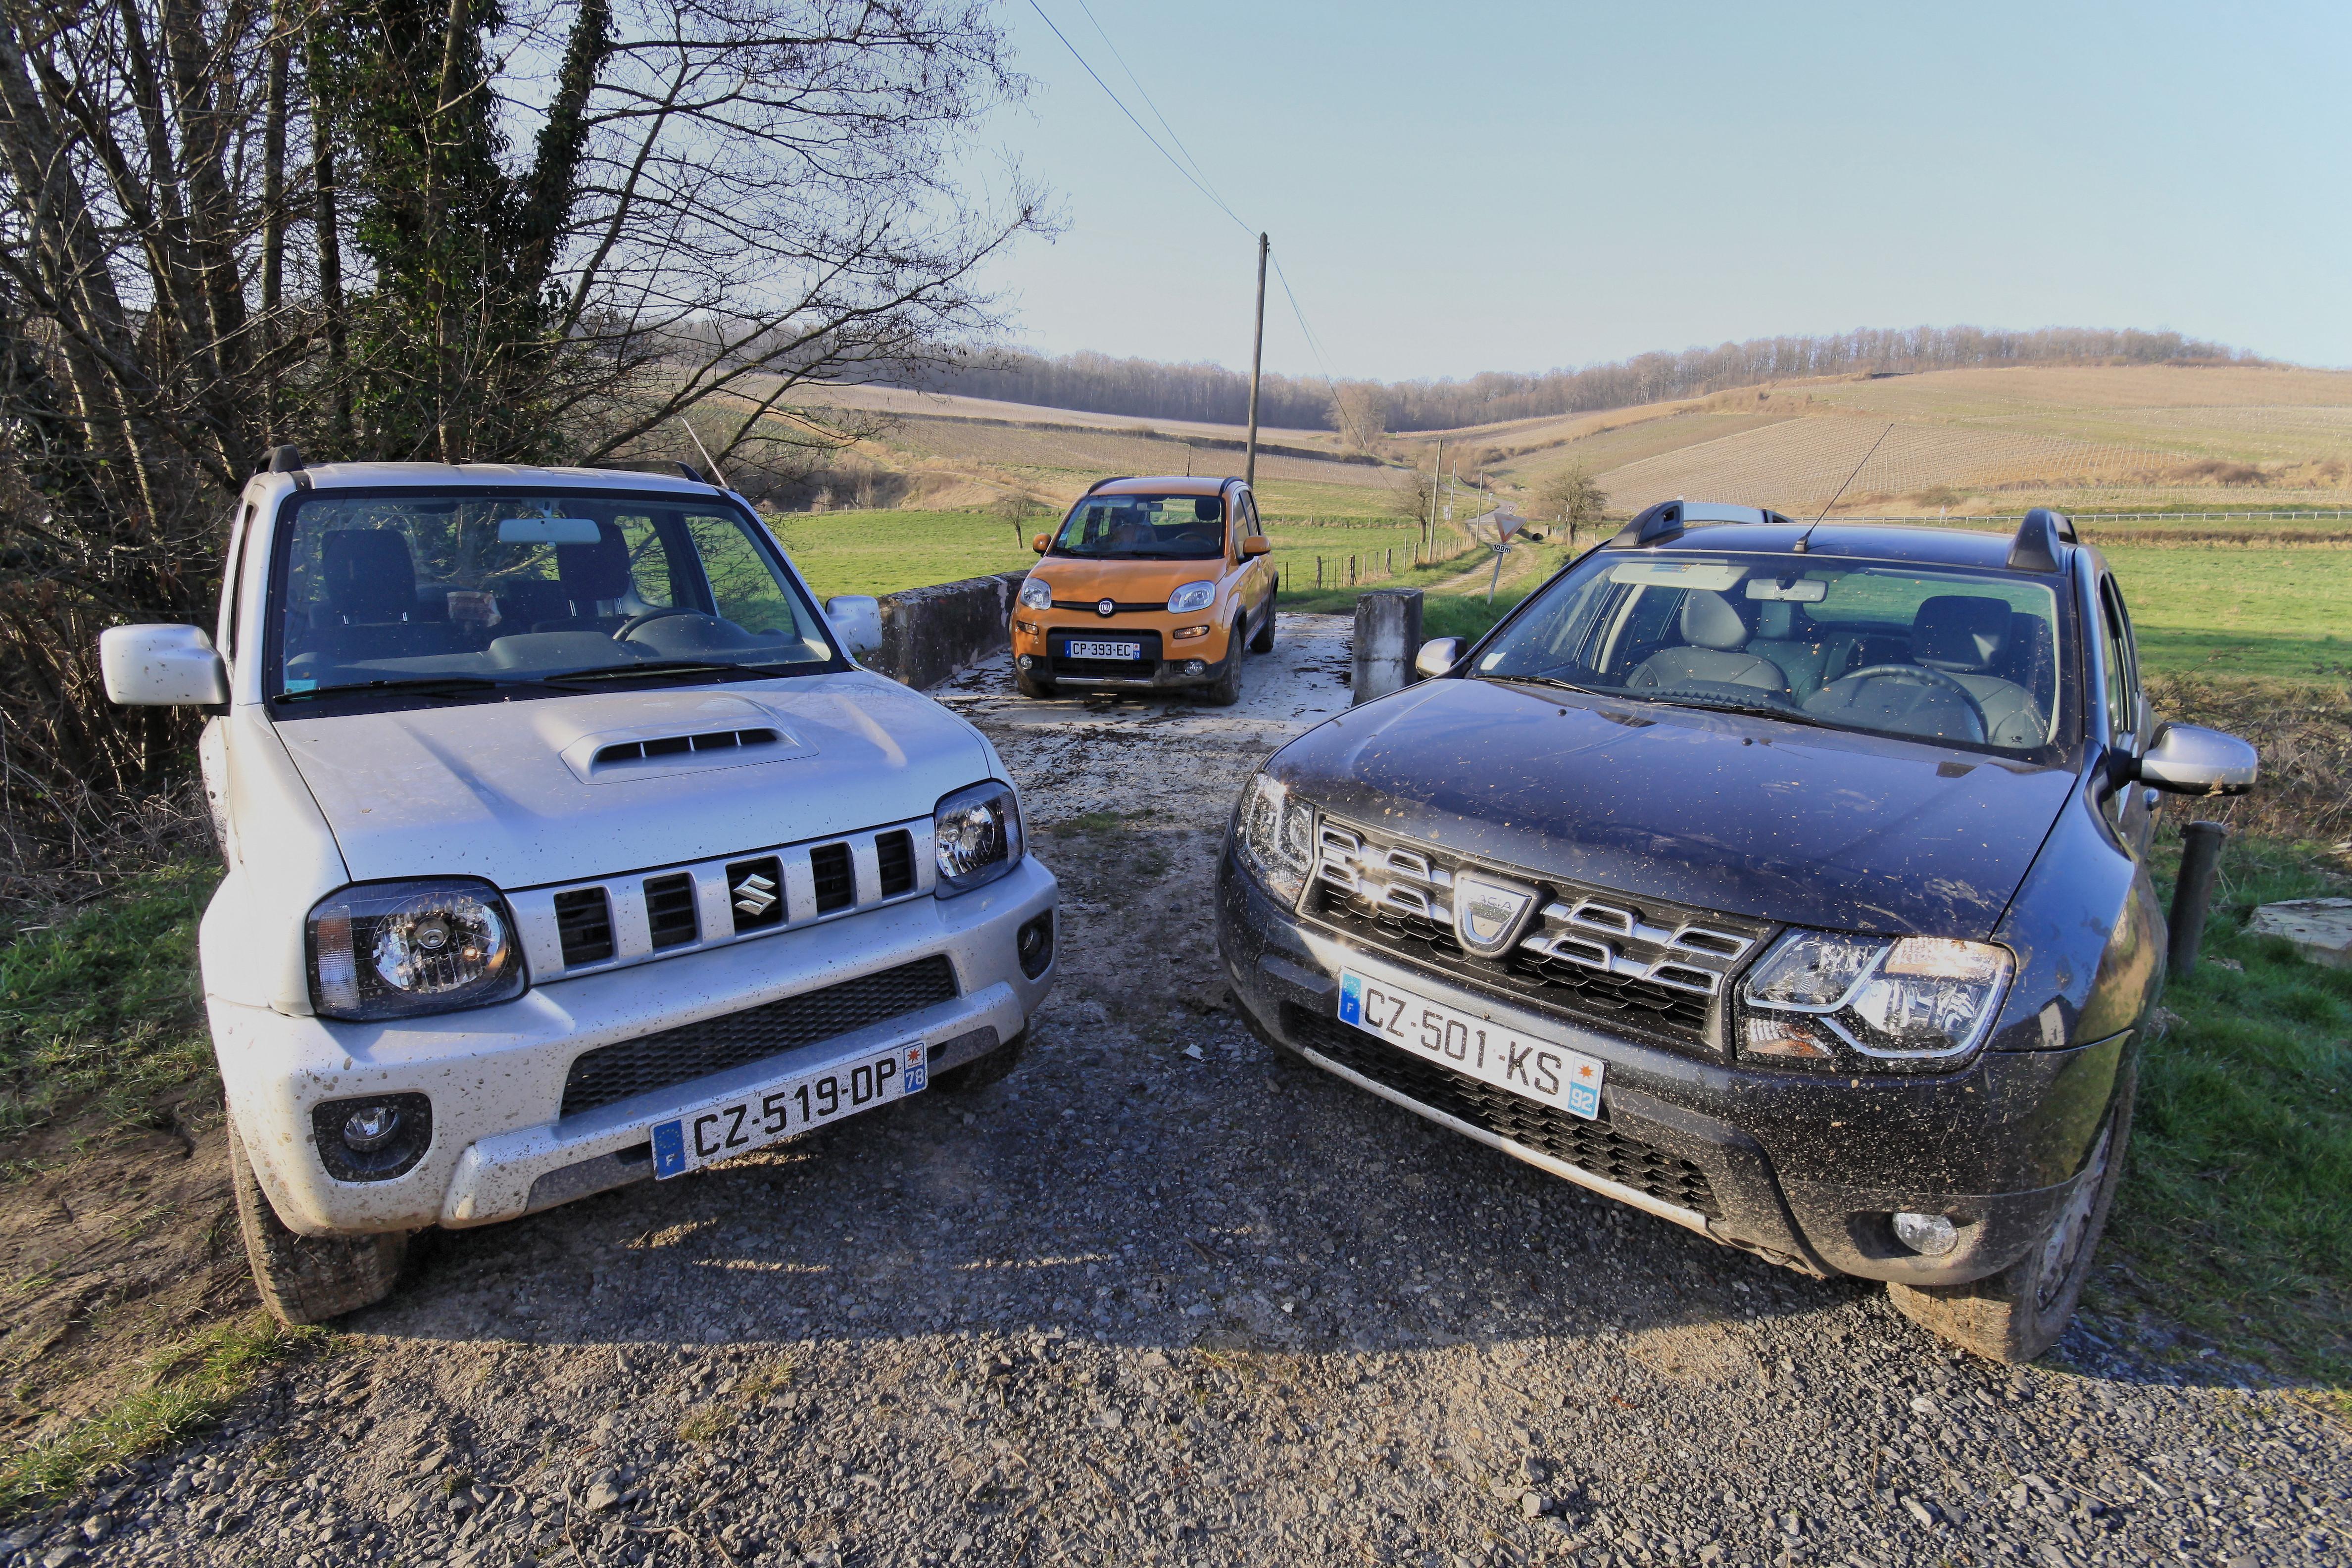 Comparatif 4×4 petit budget : Suzuki Jimny/Fiat Panda 4×4/ Dacia Duster 4×4